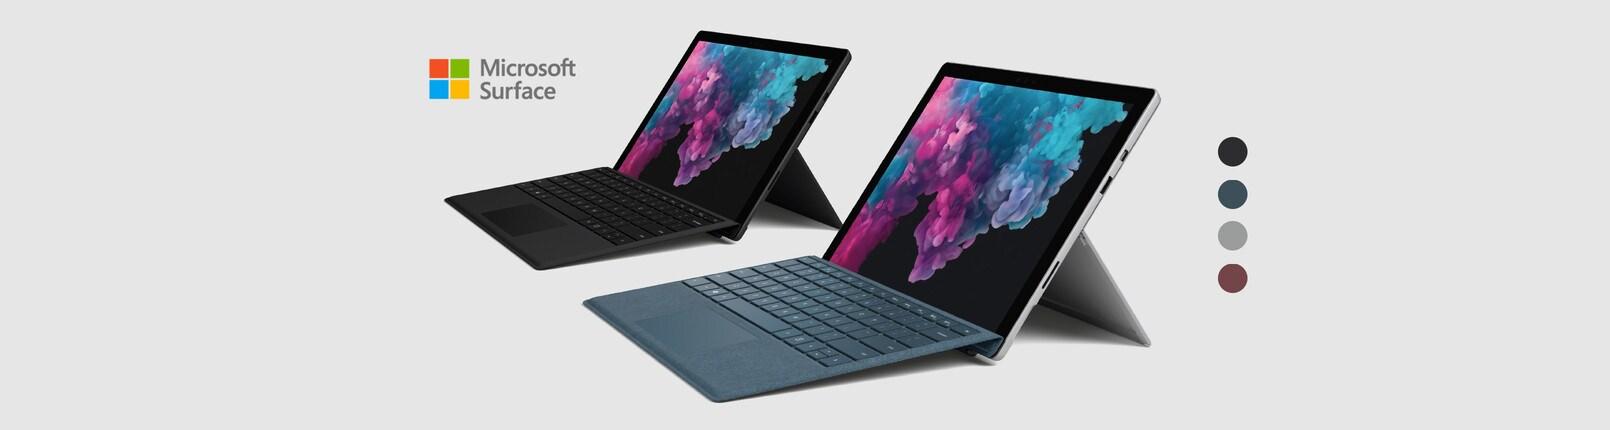 Surface Pro6 2